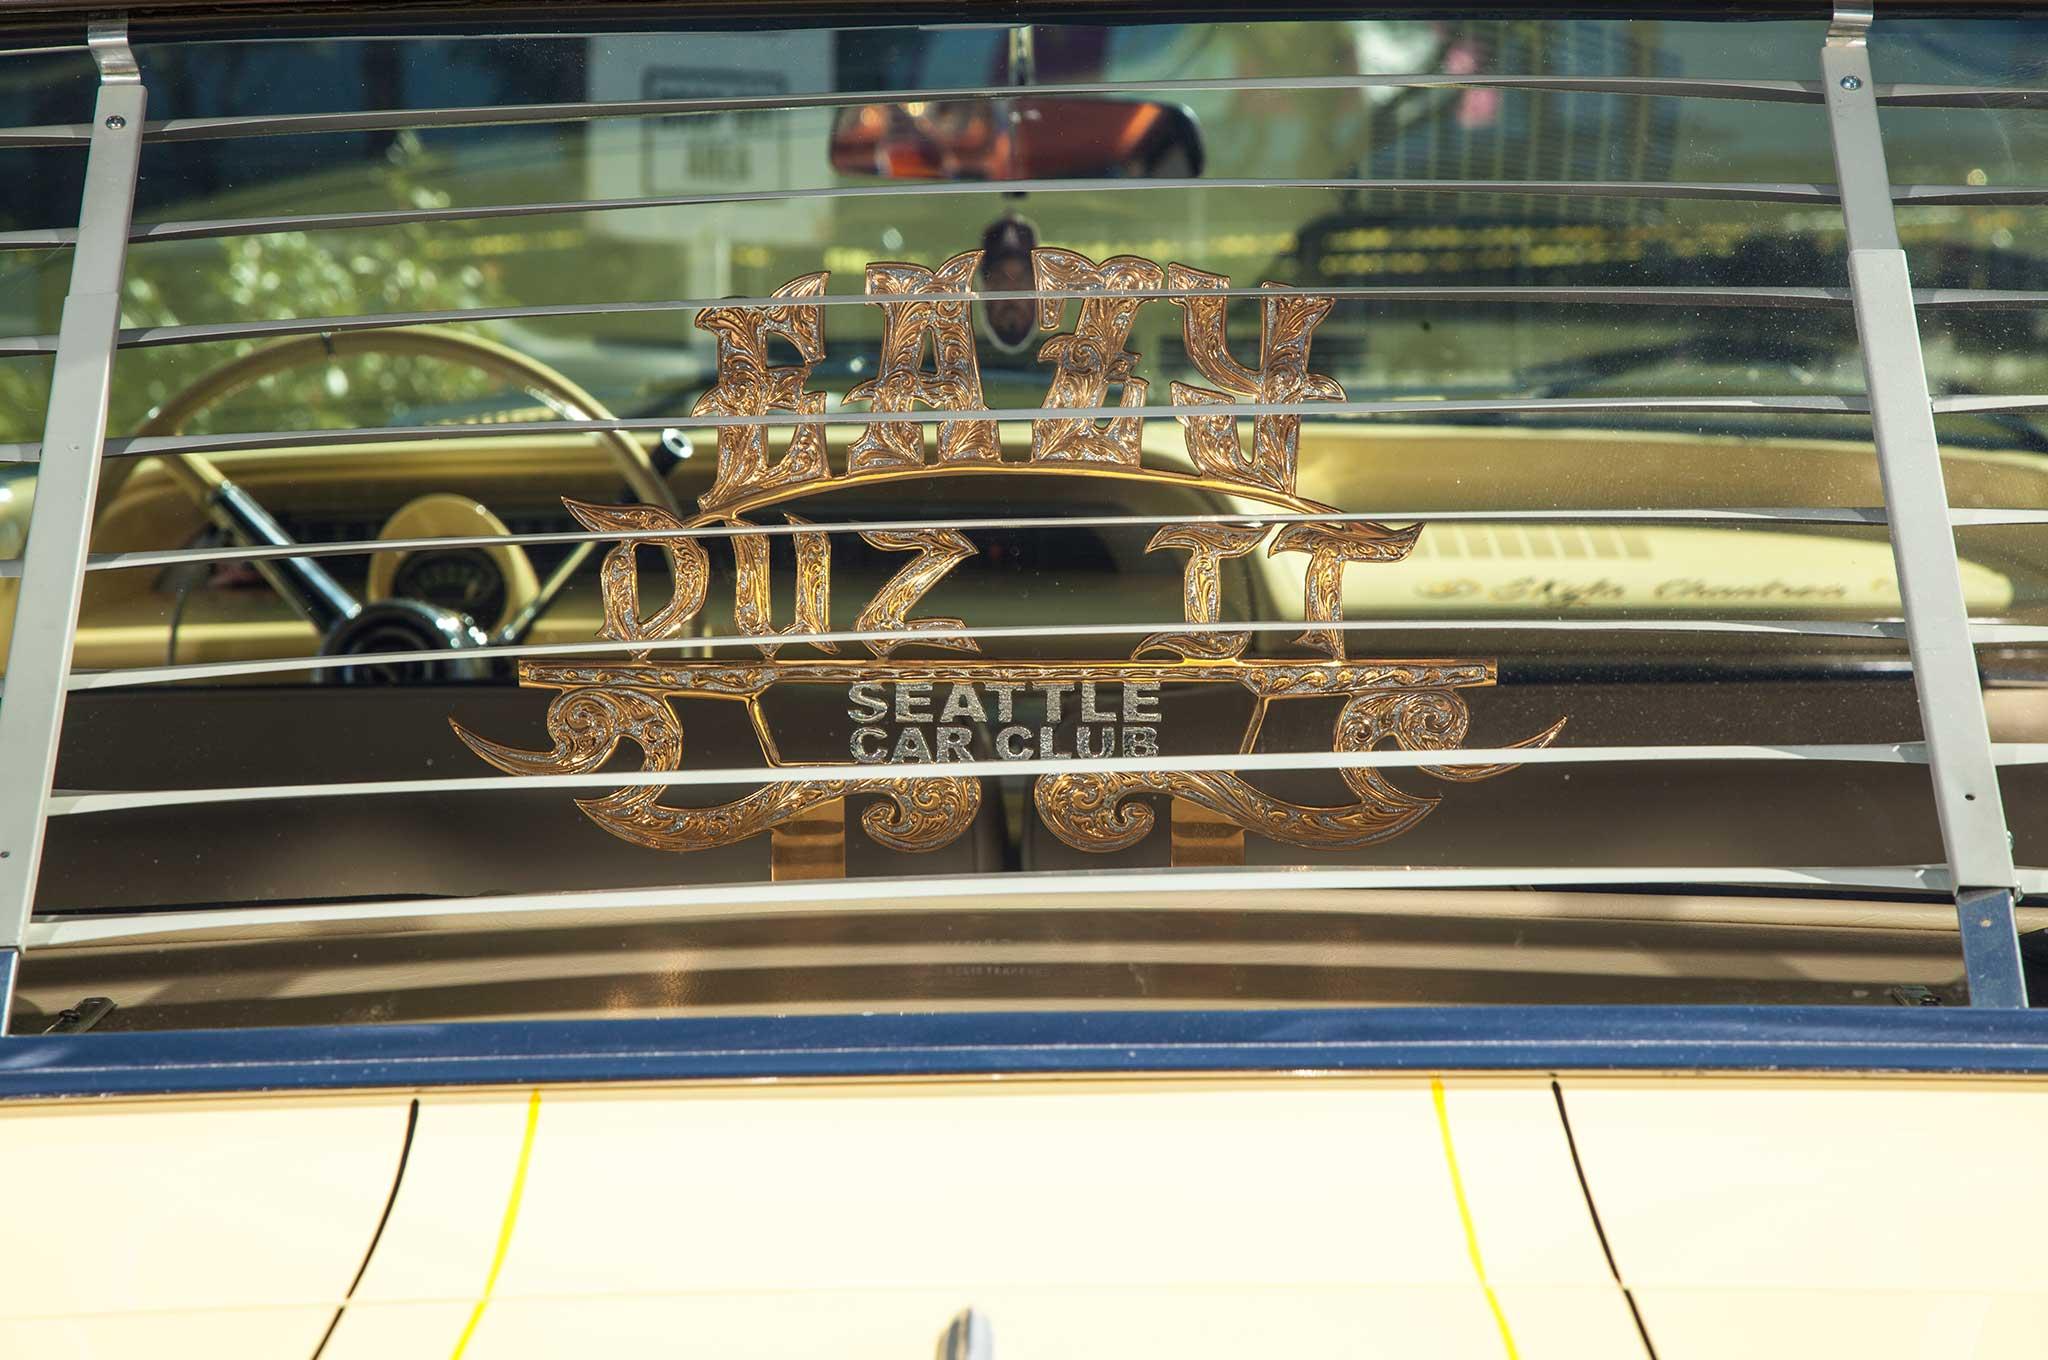 1964 chevrolet impala eazy duz it club plaque 010